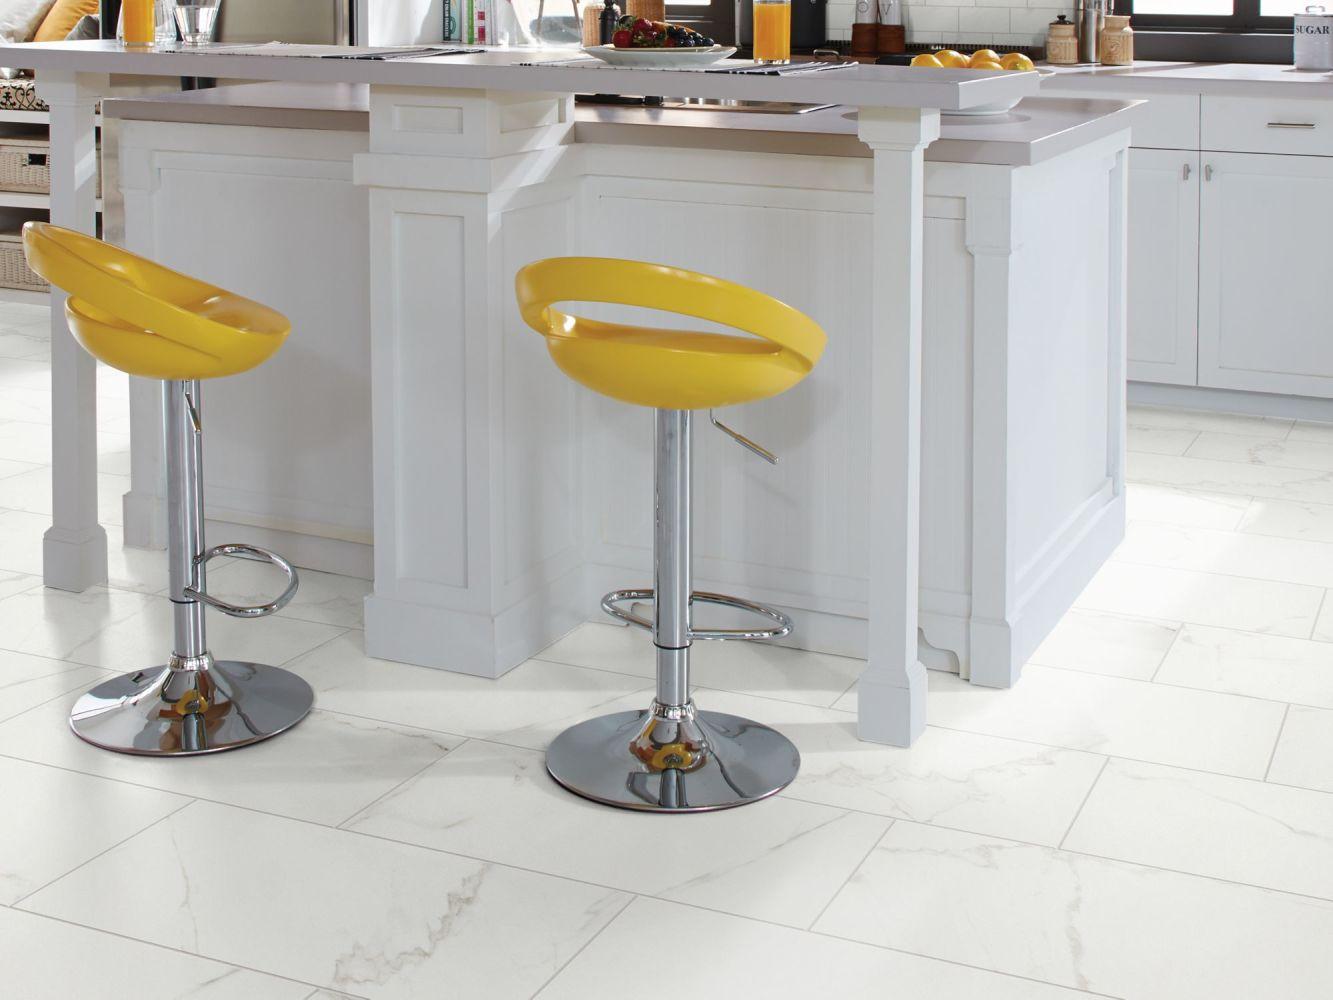 Shaw Floors Home Fn Gold Ceramic Caracalla Sbn Calacatta 00170_TGM48